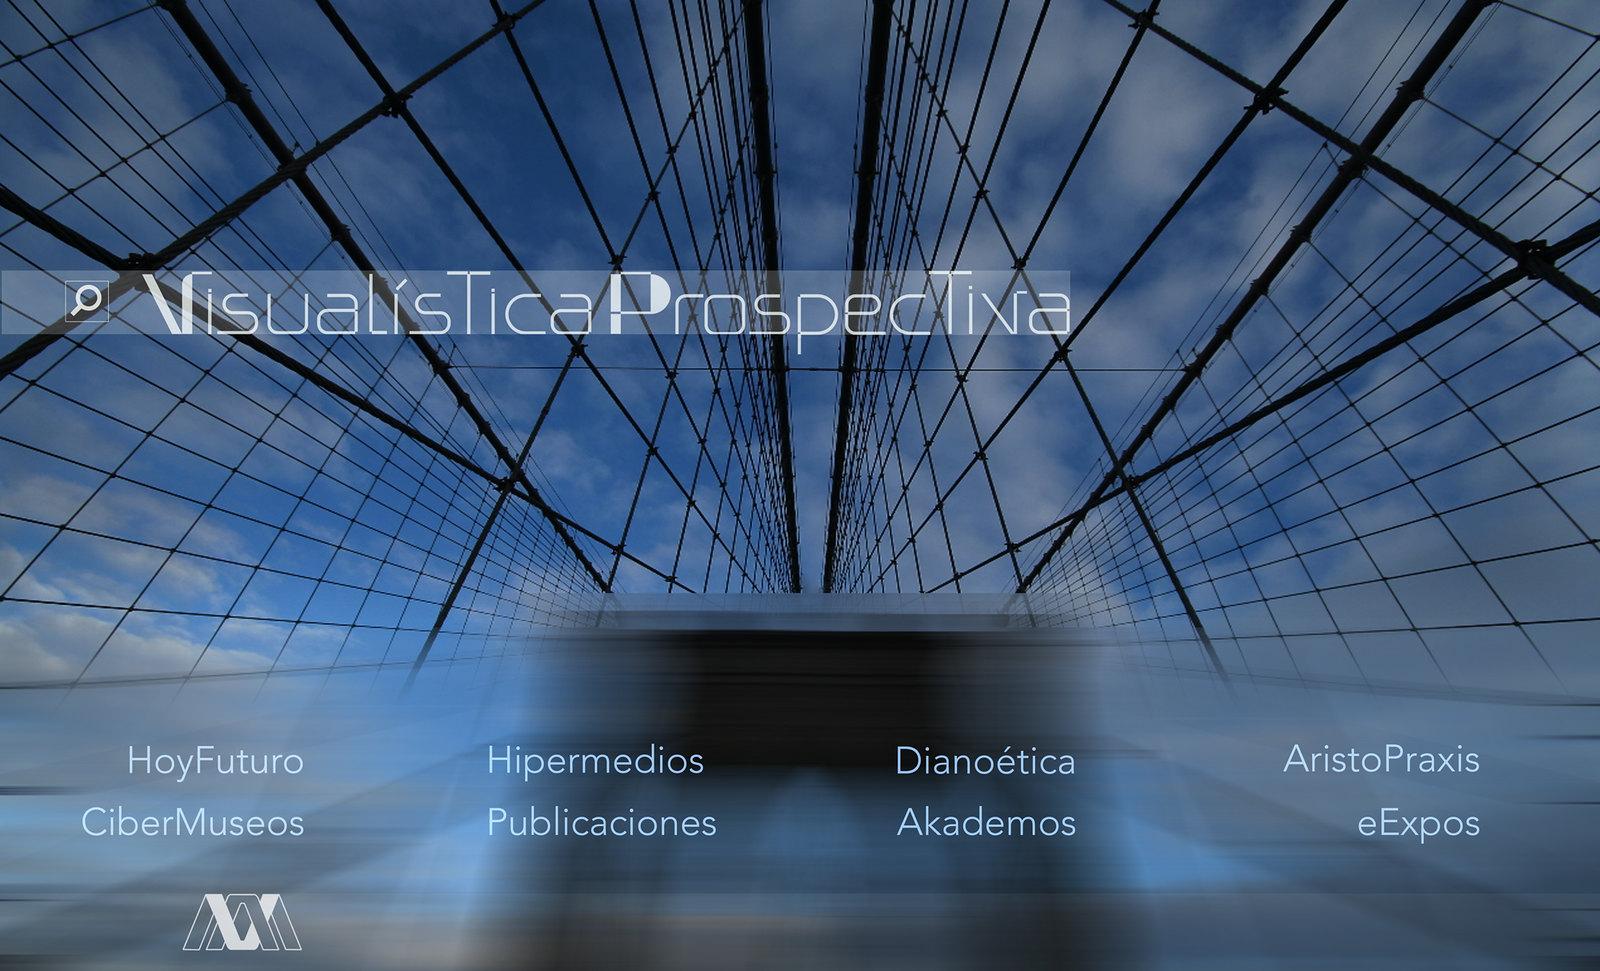 Visualística Prospectiva